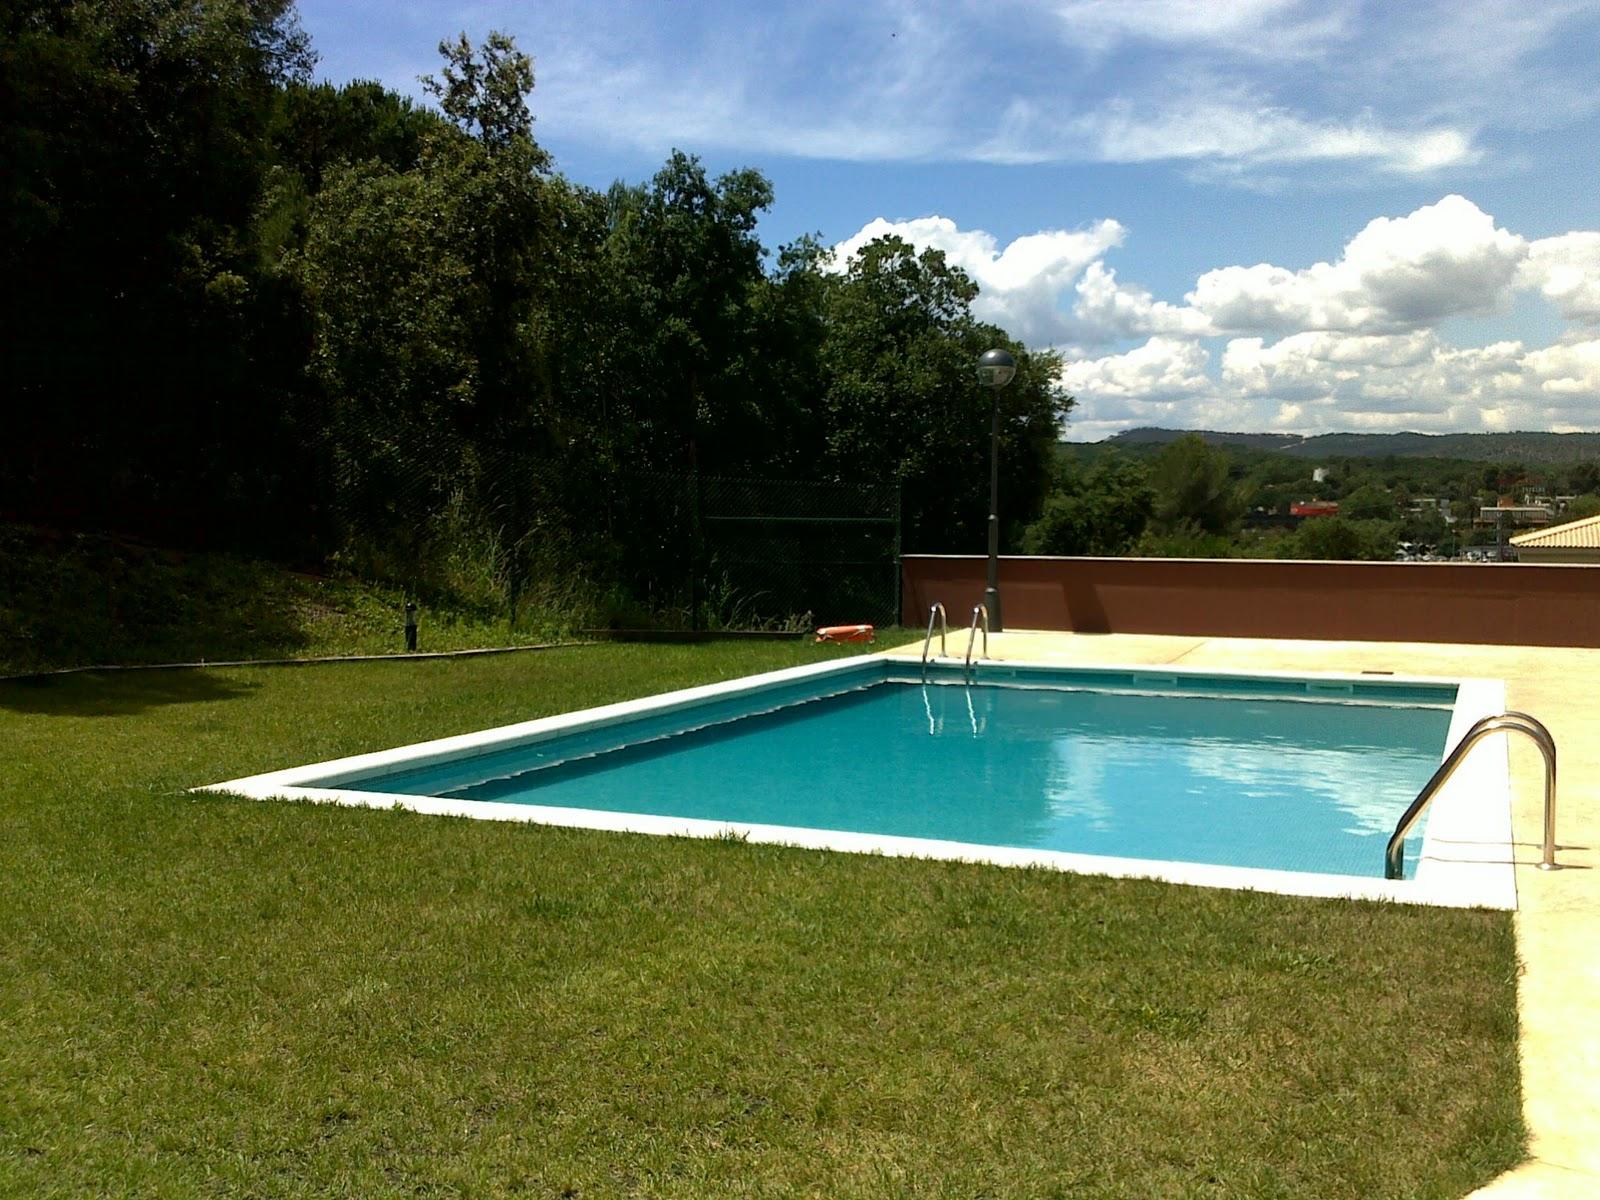 Apartamento con encanto lloret de mar piscina for Piscina vilassar de mar